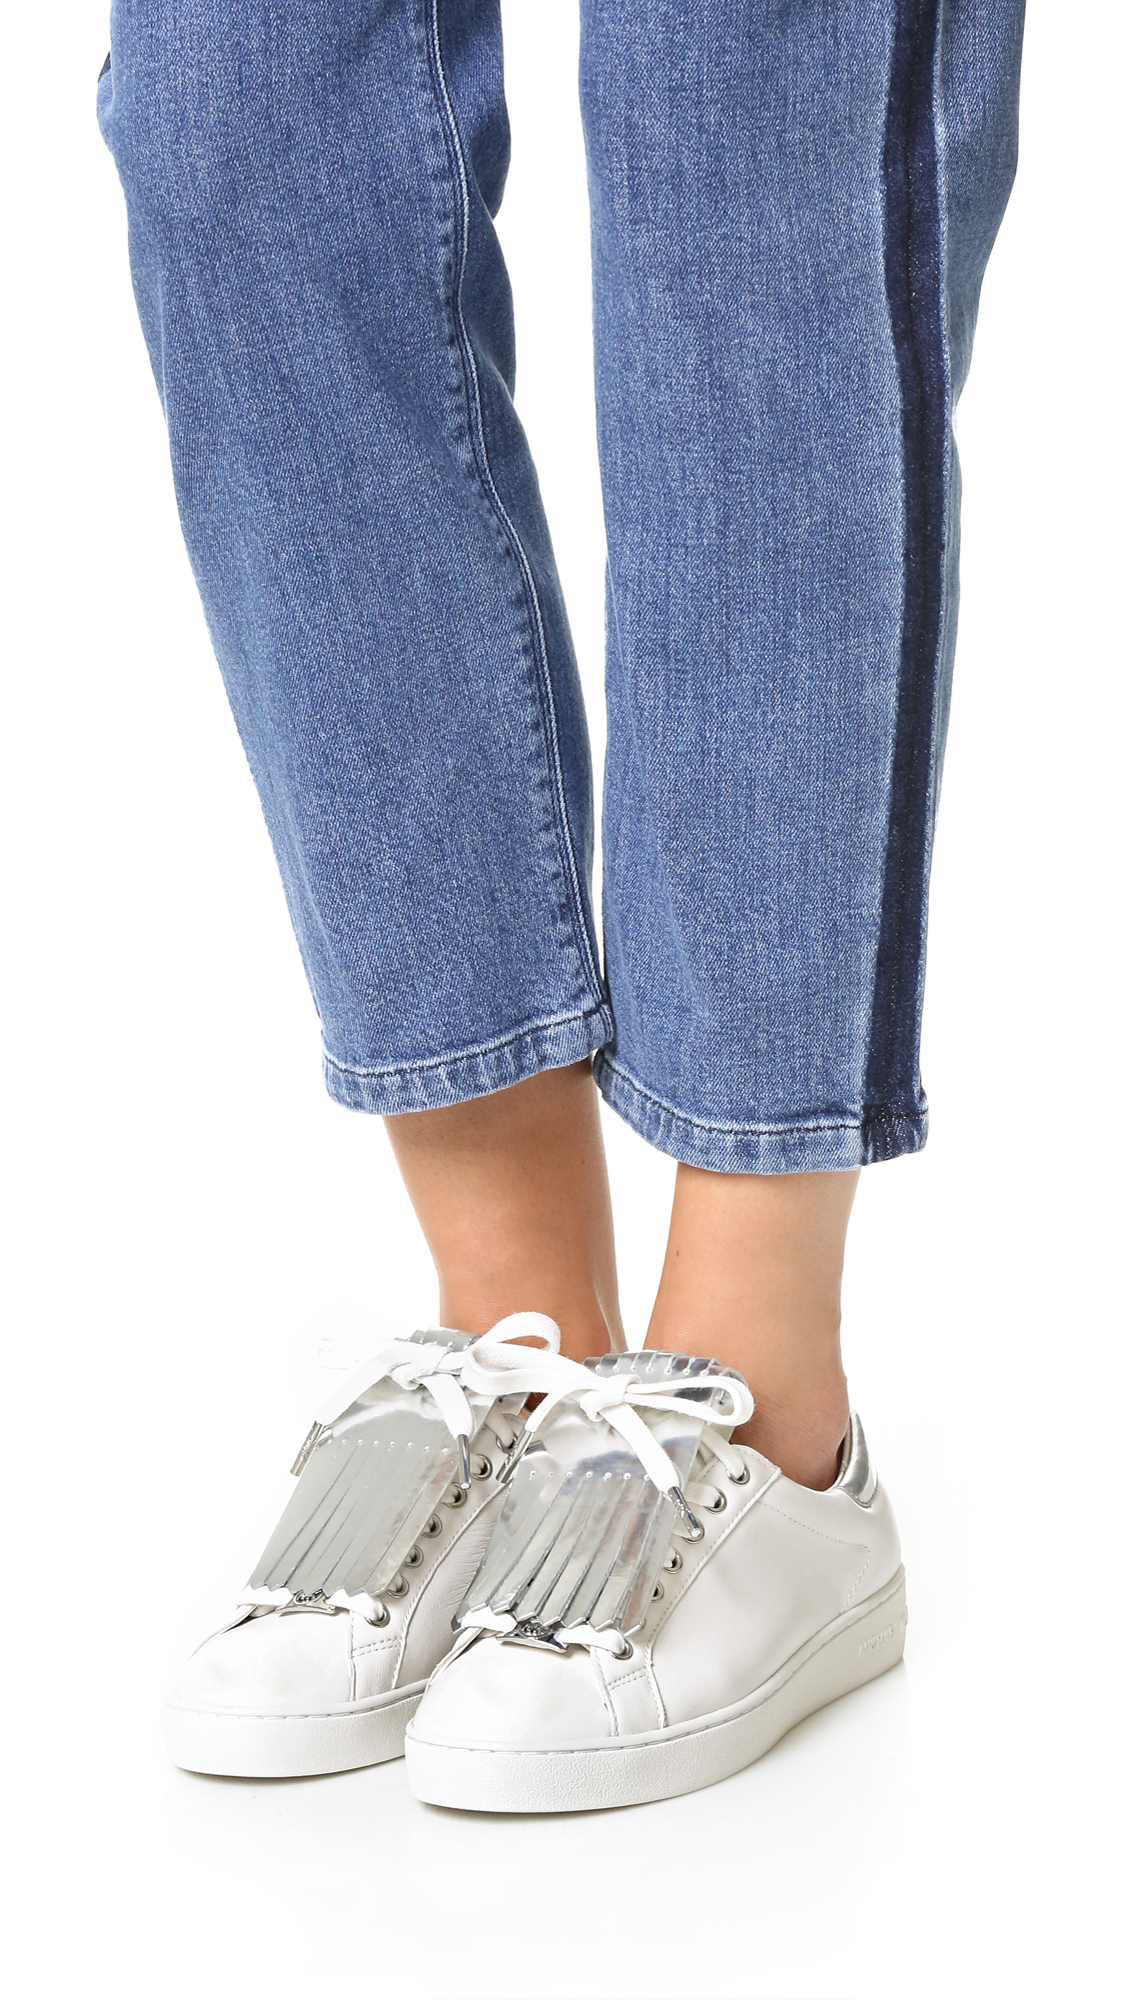 bcd530099e38 Lyst - MICHAEL Michael Kors Keaton Kiltie Sneakers